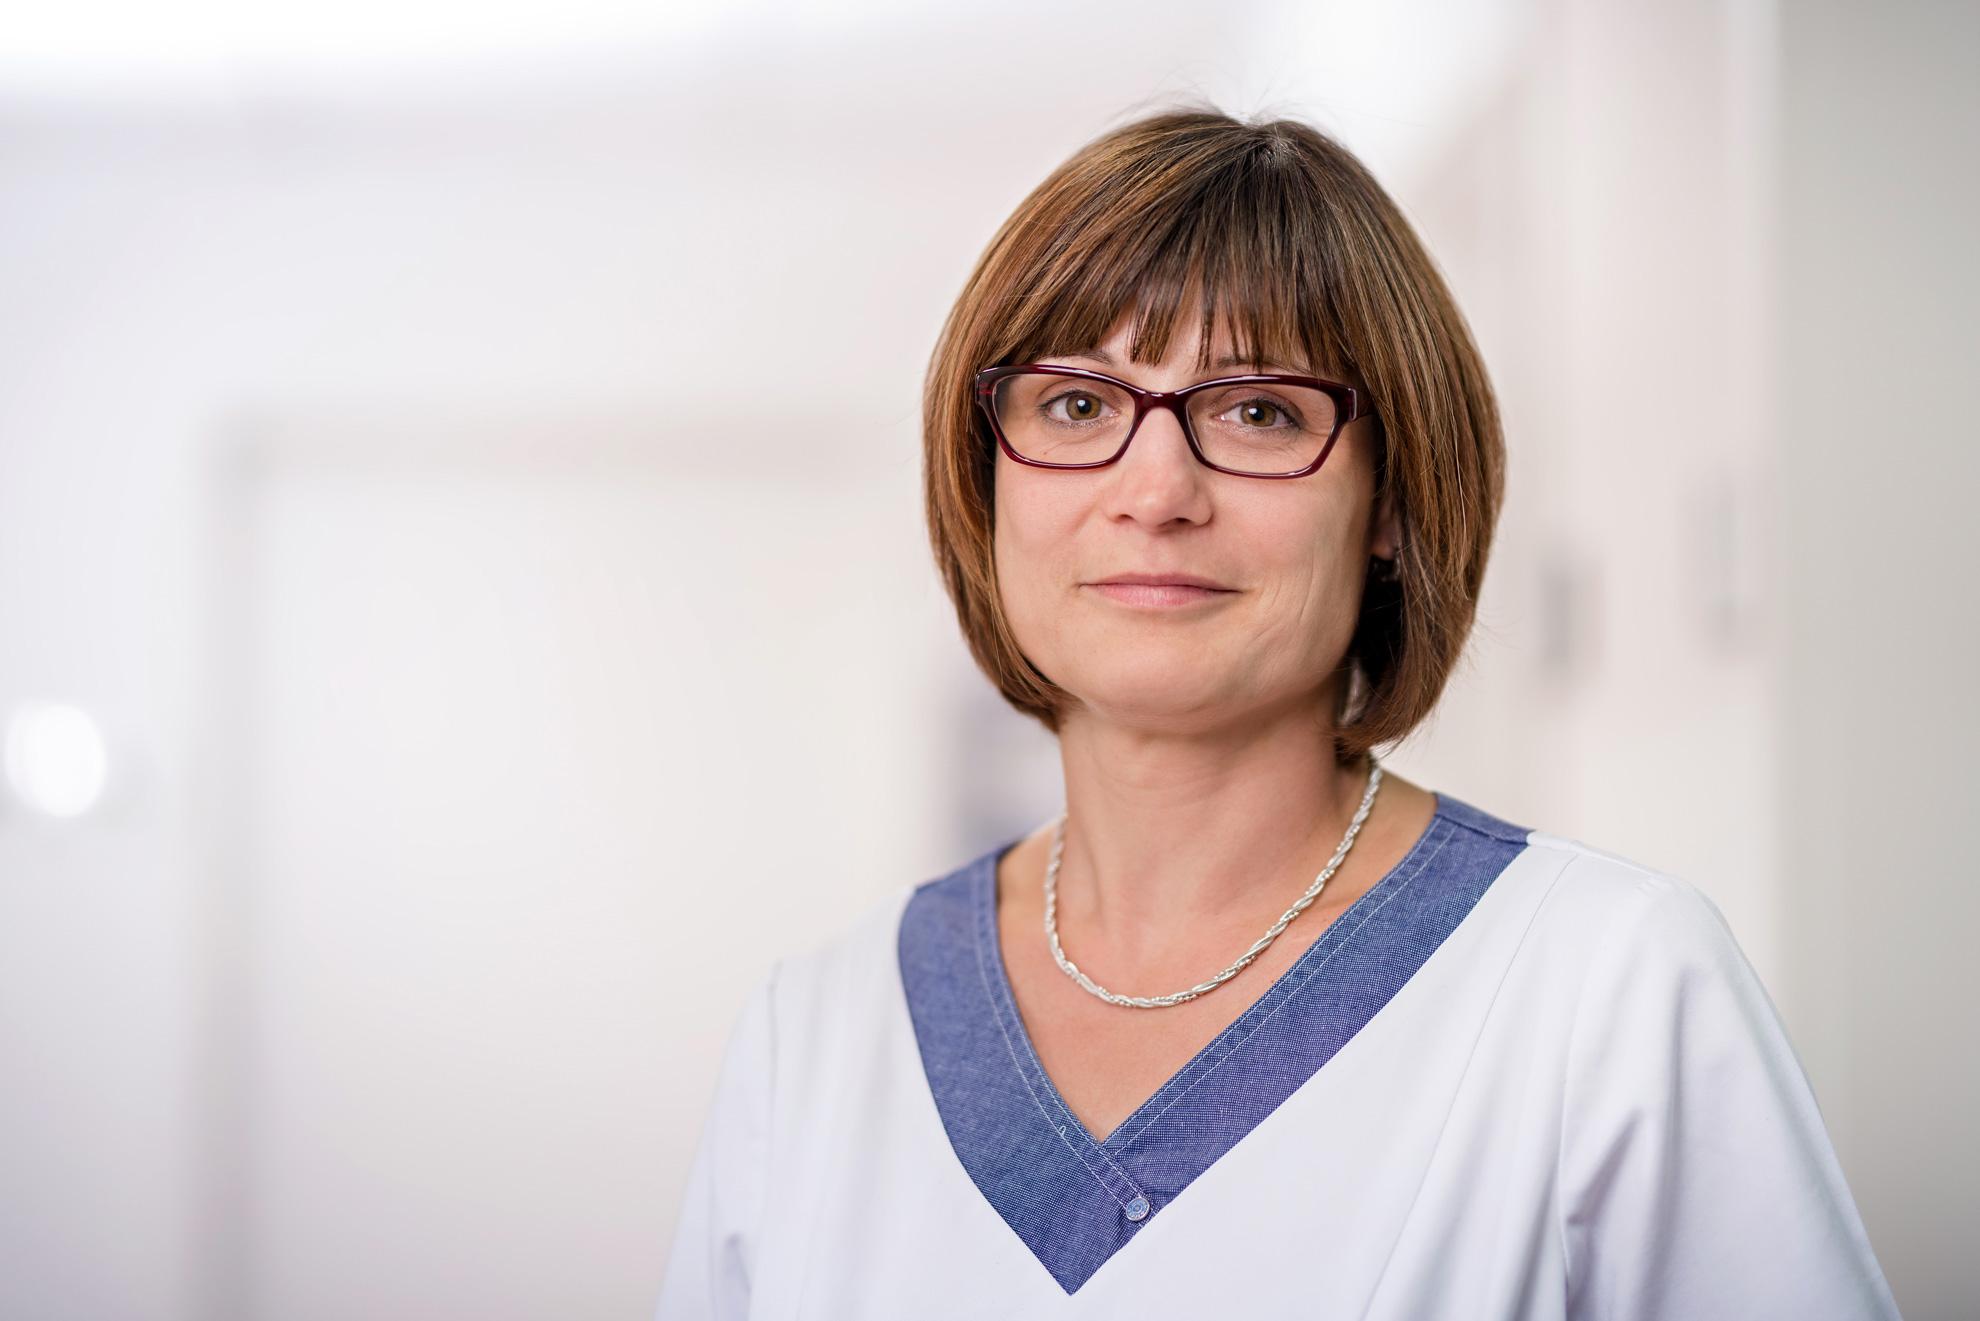 Daniela Oehler